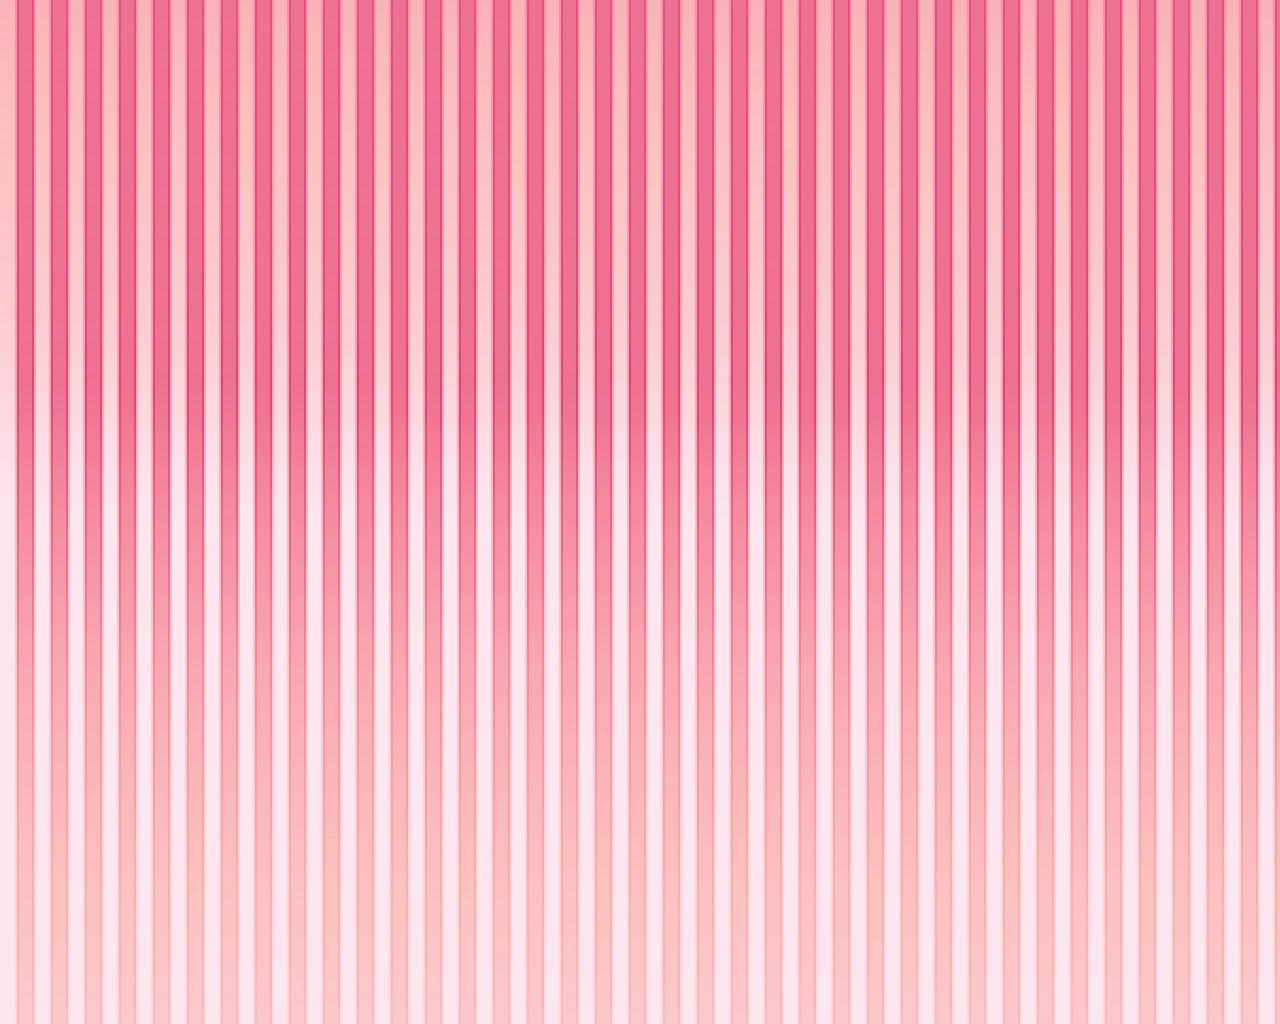 Sh Yn Design: Stripe Wallpaper - Pink & Peach Colour Part 2